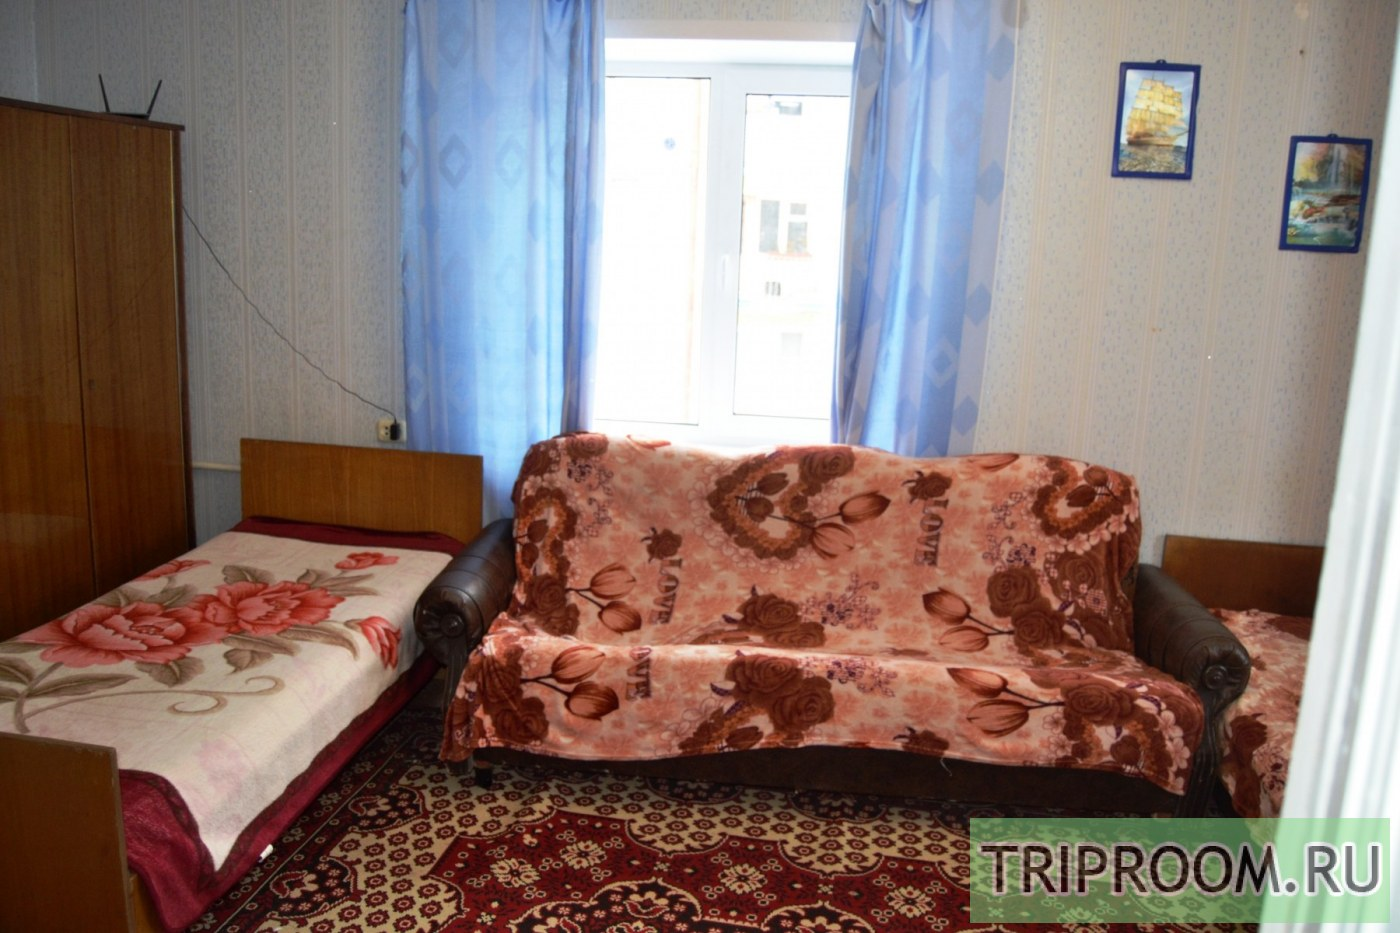 1-комнатная квартира посуточно (вариант № 38767), ул. Дохтурова улица, фото № 3